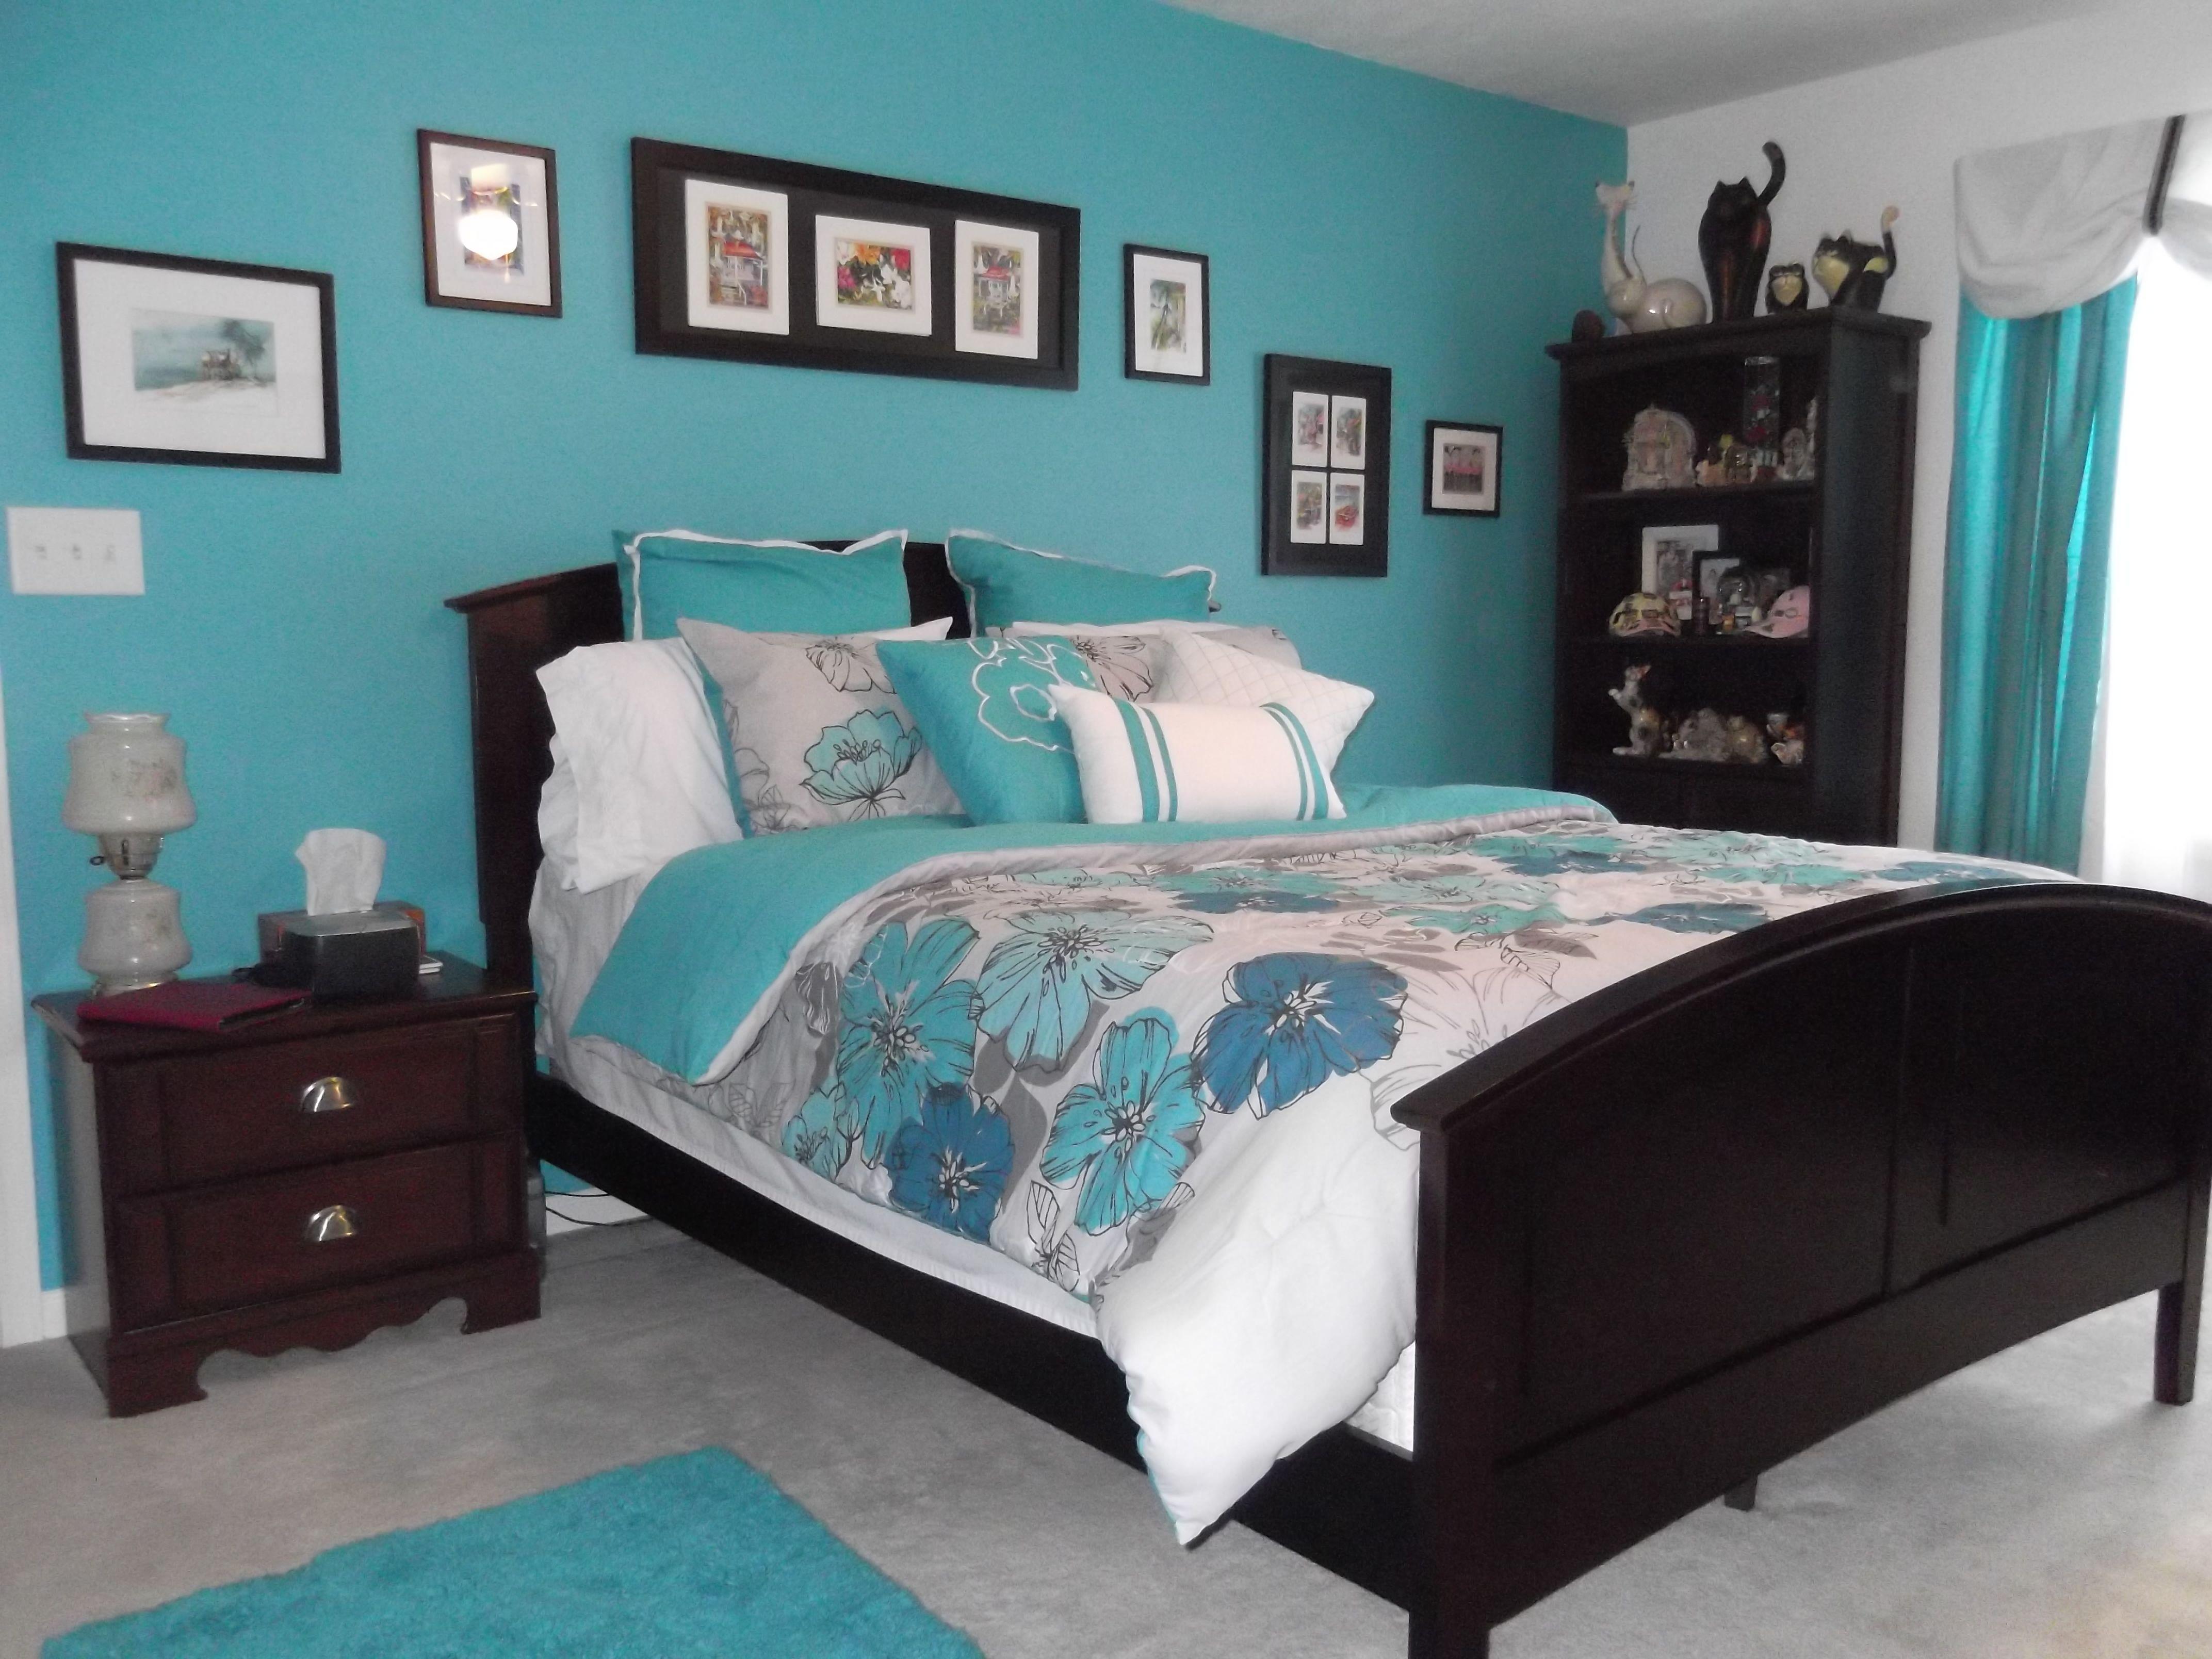 Bedroom Redo Bedroom Makeover Home Decor Bedroom Wall